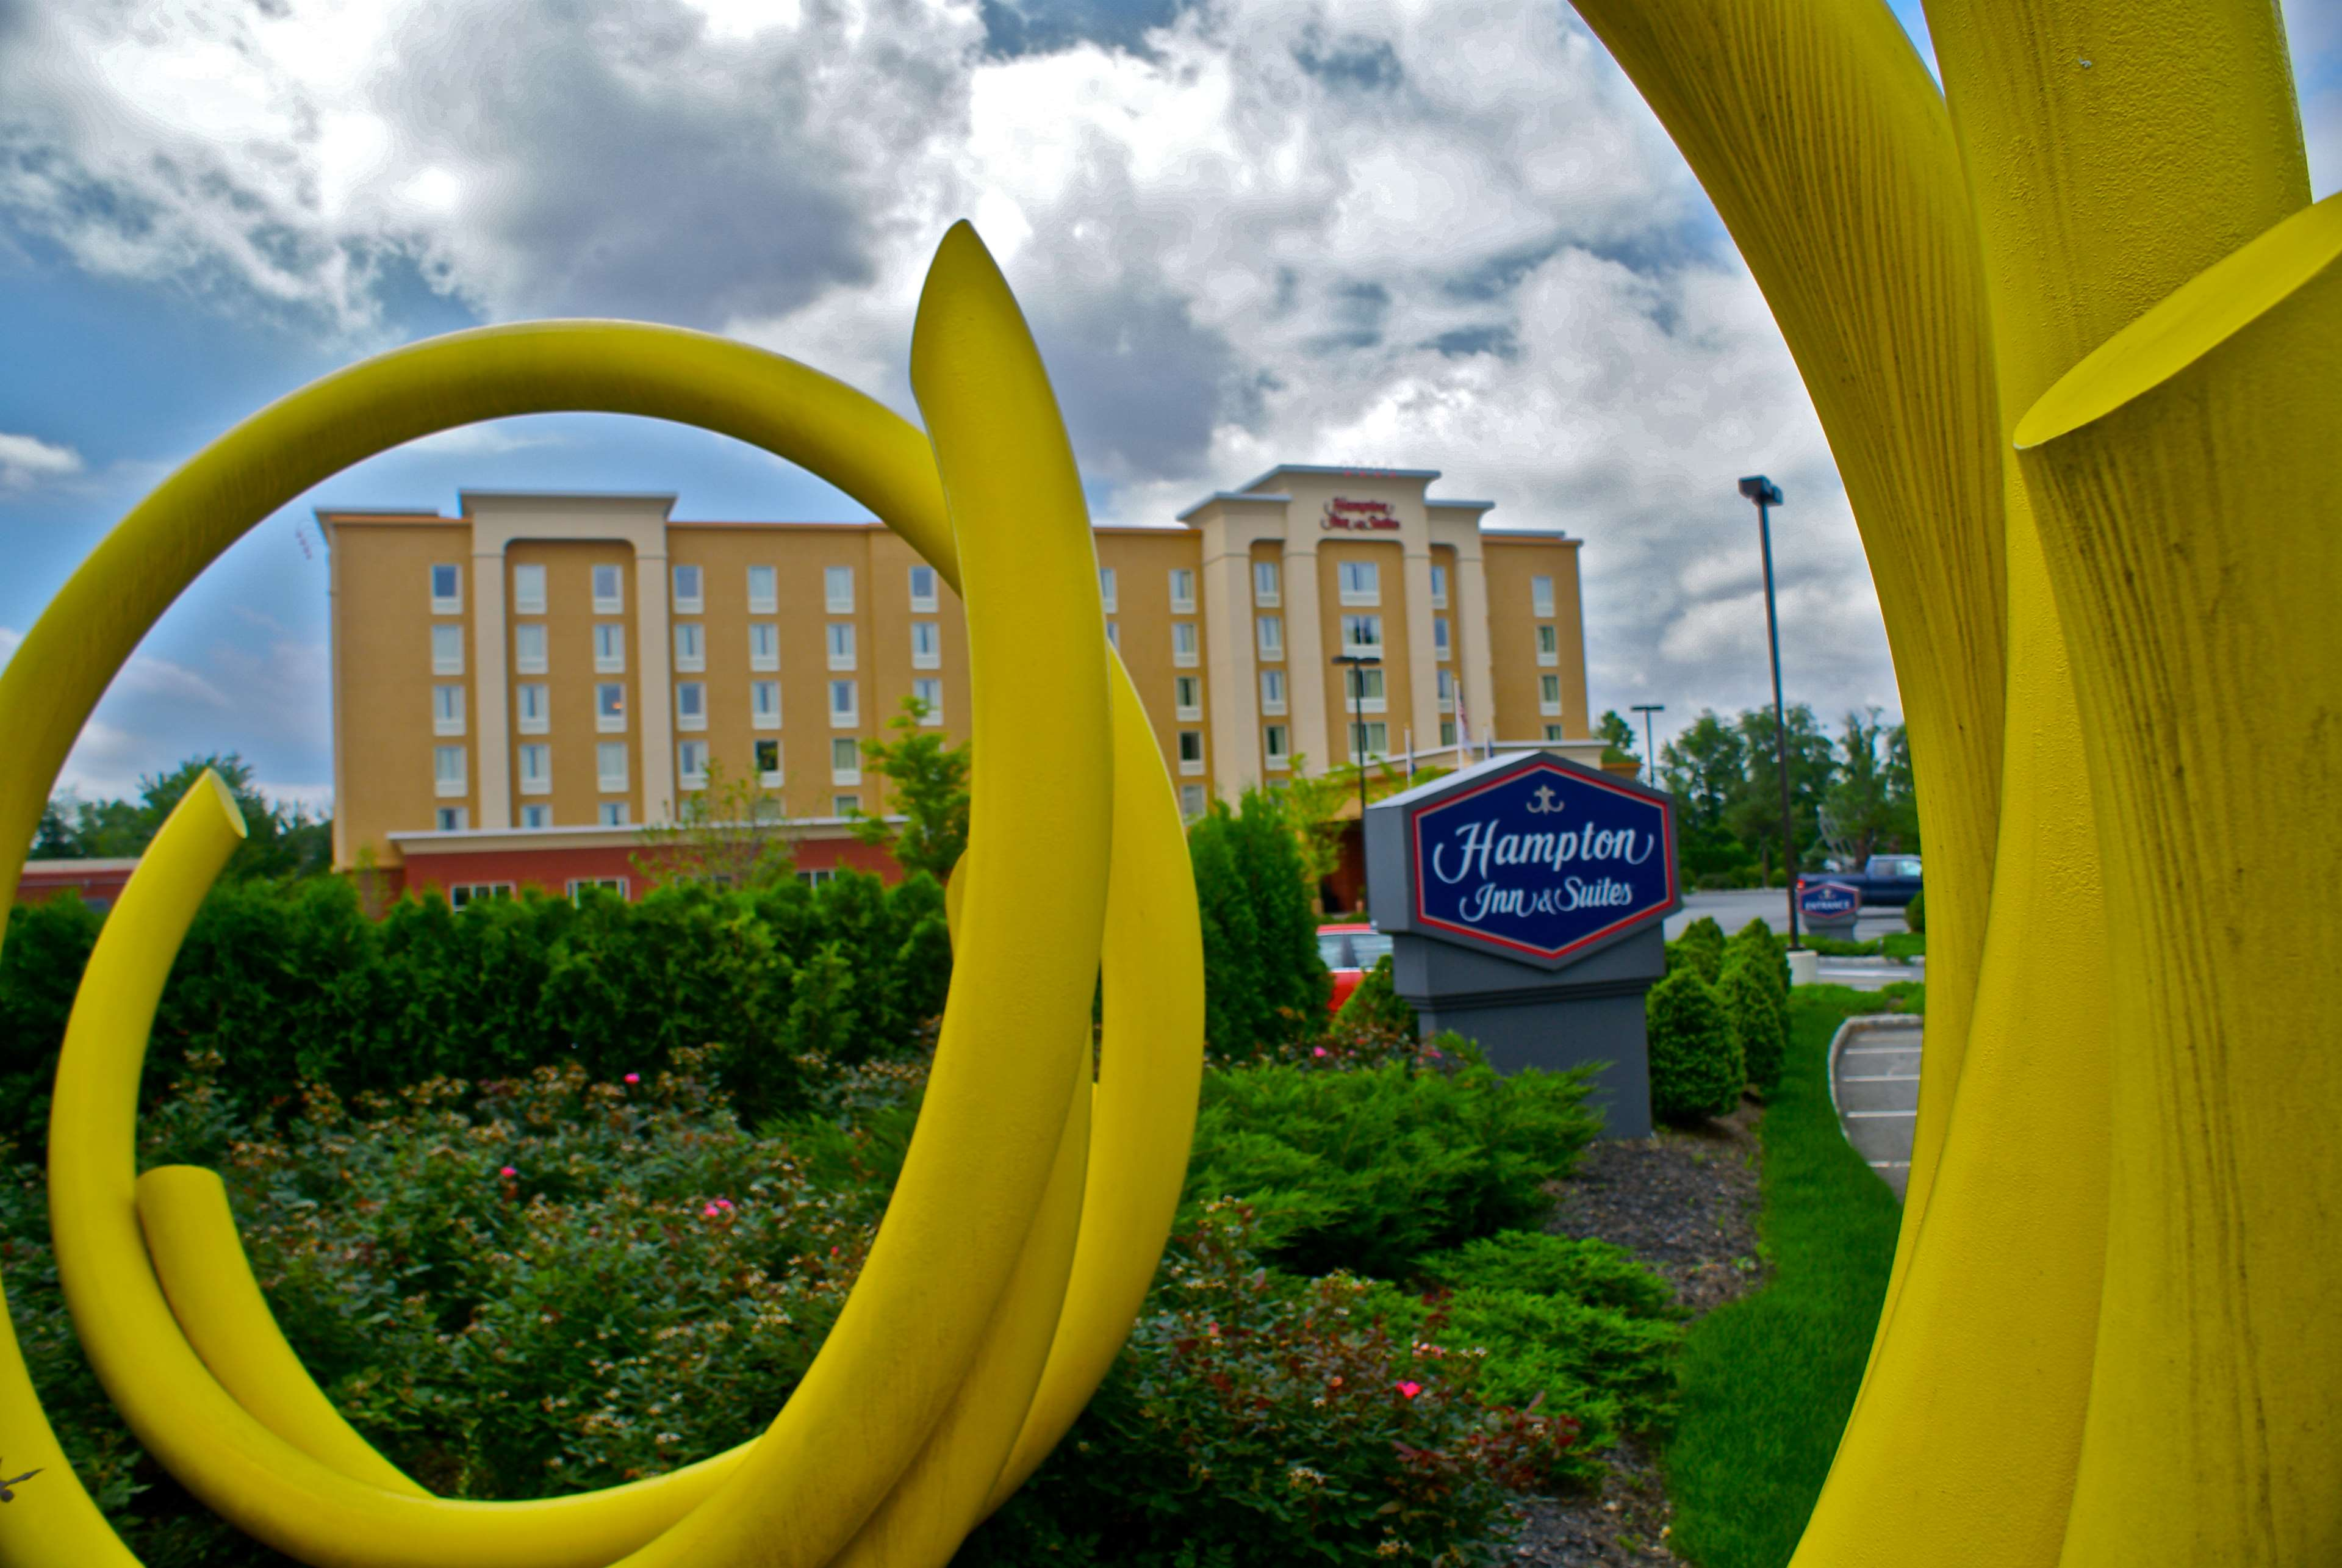 Hampton Inn & Suites Staten Island image 1